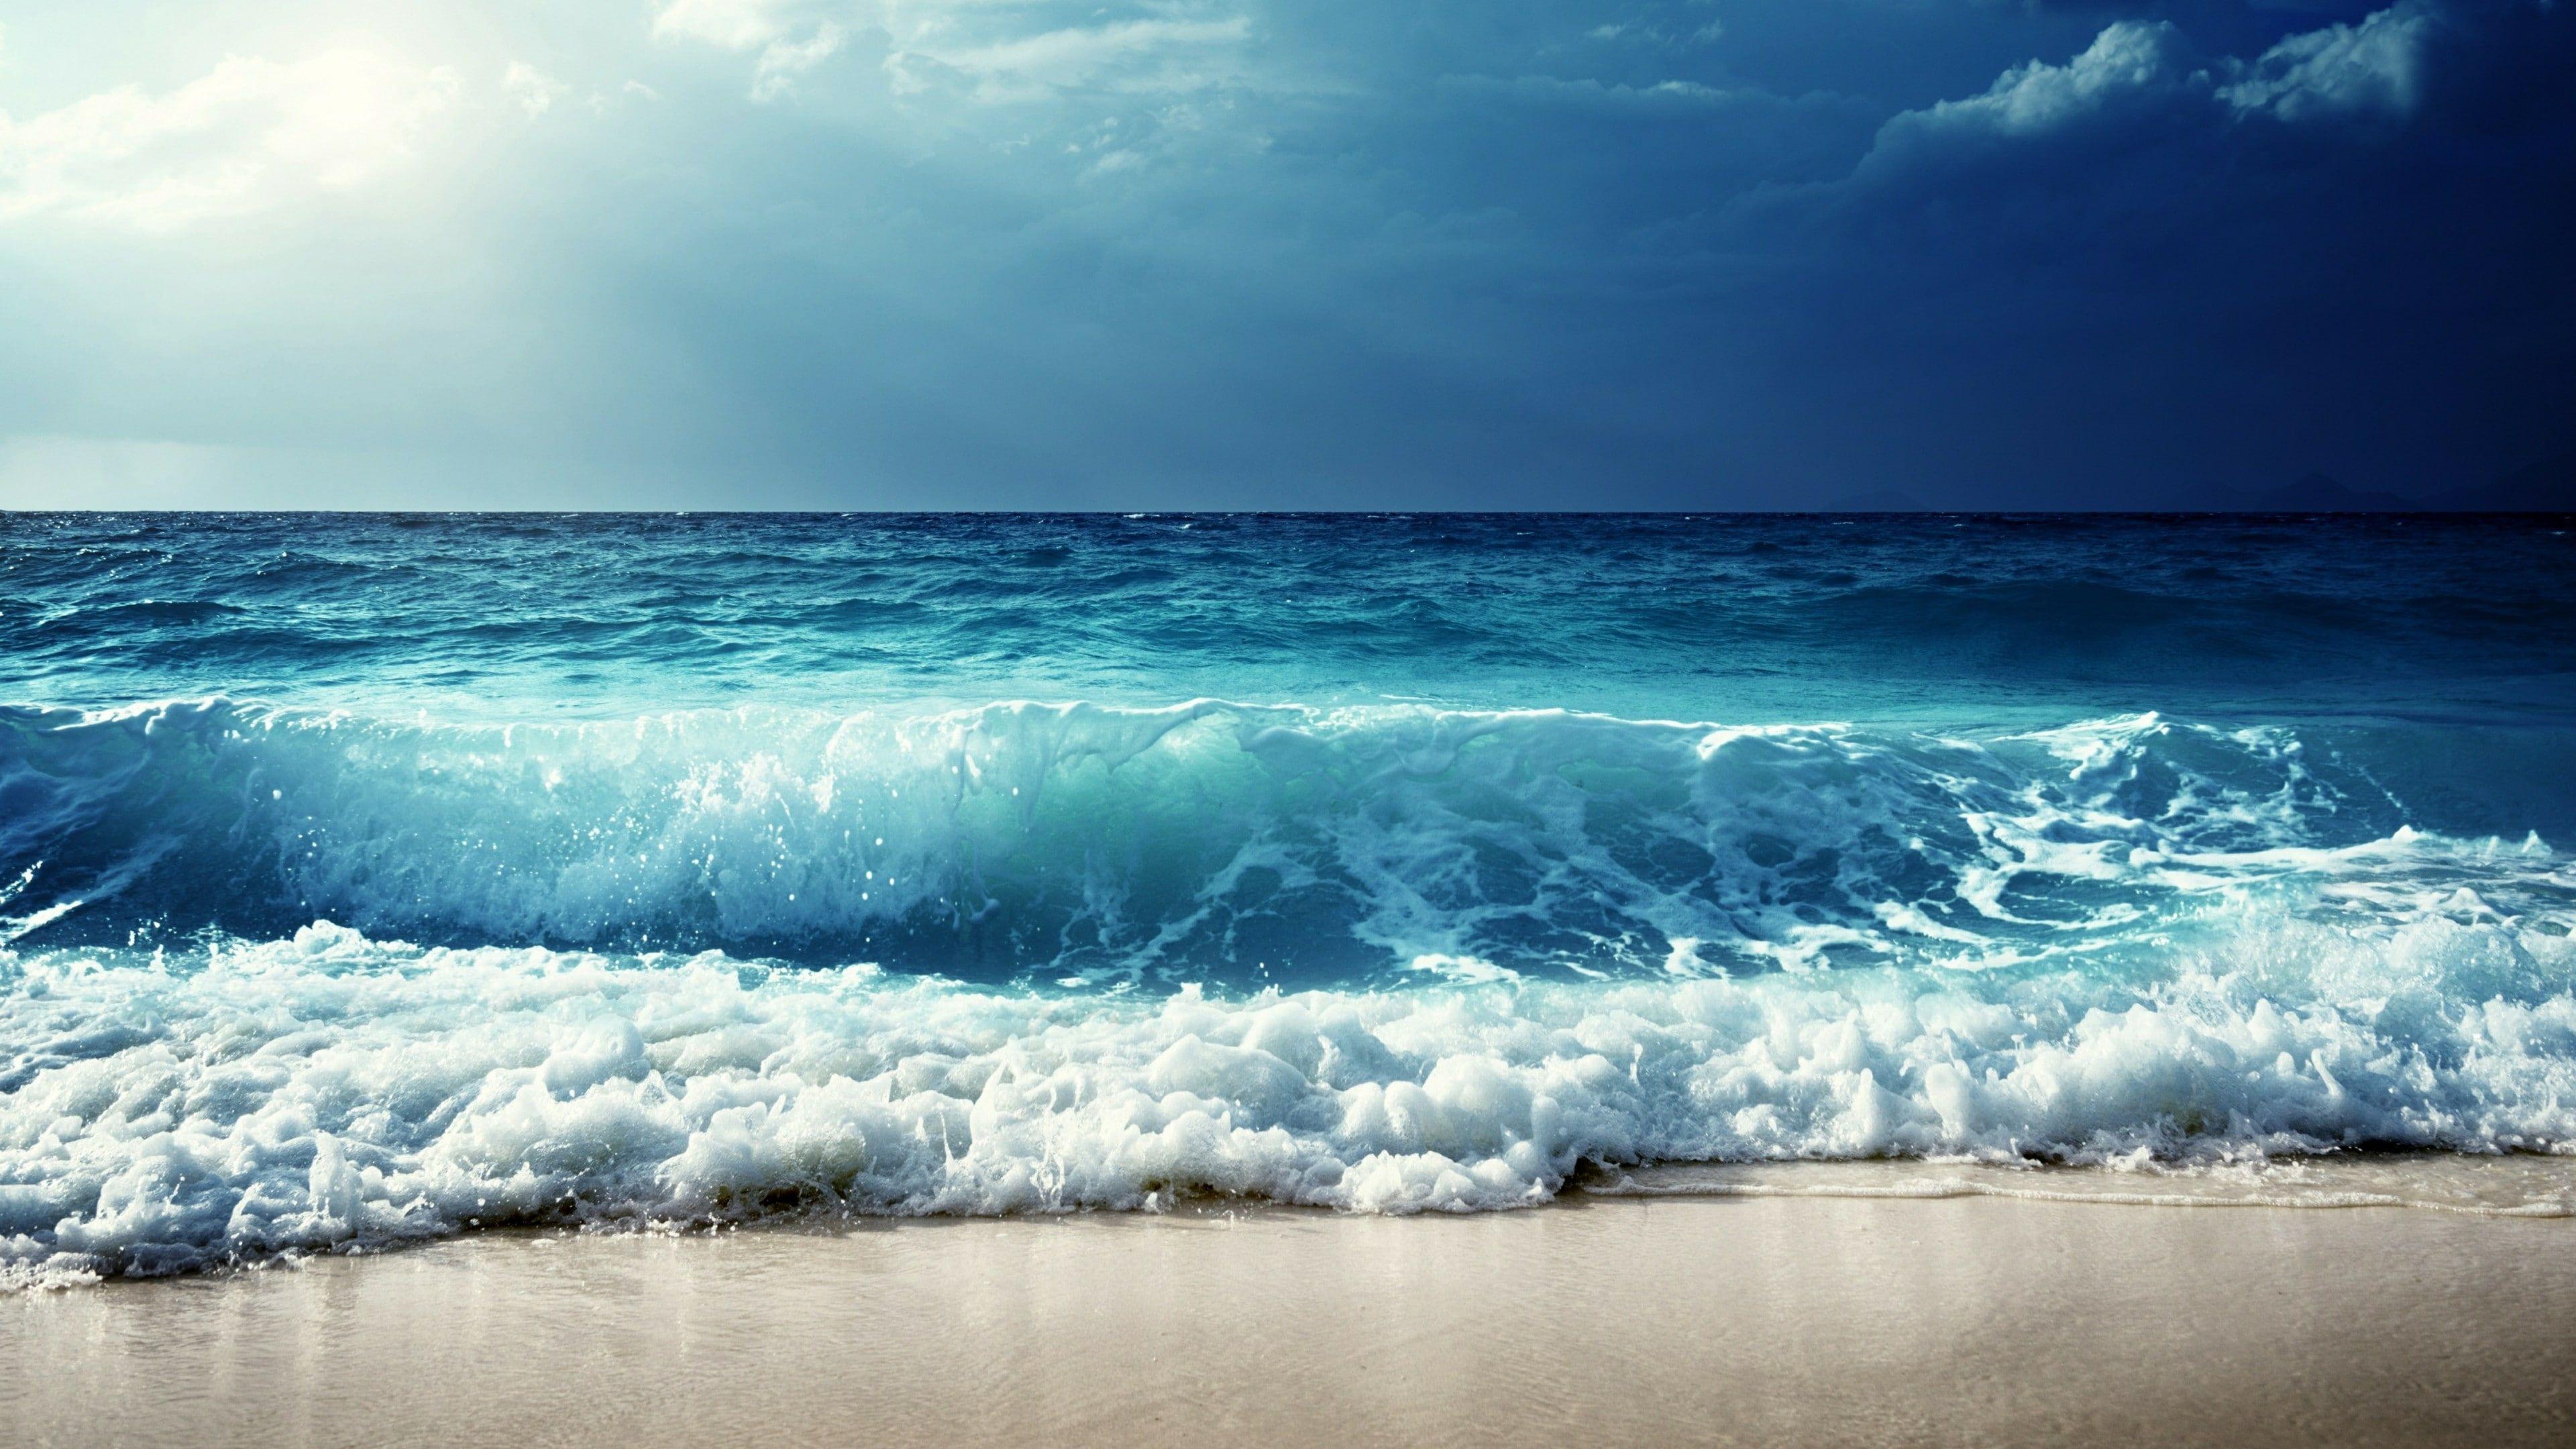 Sea Wave Ocean Sky Body Of Water Shore Horizon Wind Wave Water Cloud Daytime Beach Calm Sunlight 4k W Waves Wallpaper Waves Photography Wallpaper Hd wallpaper surfer wave ocean sky